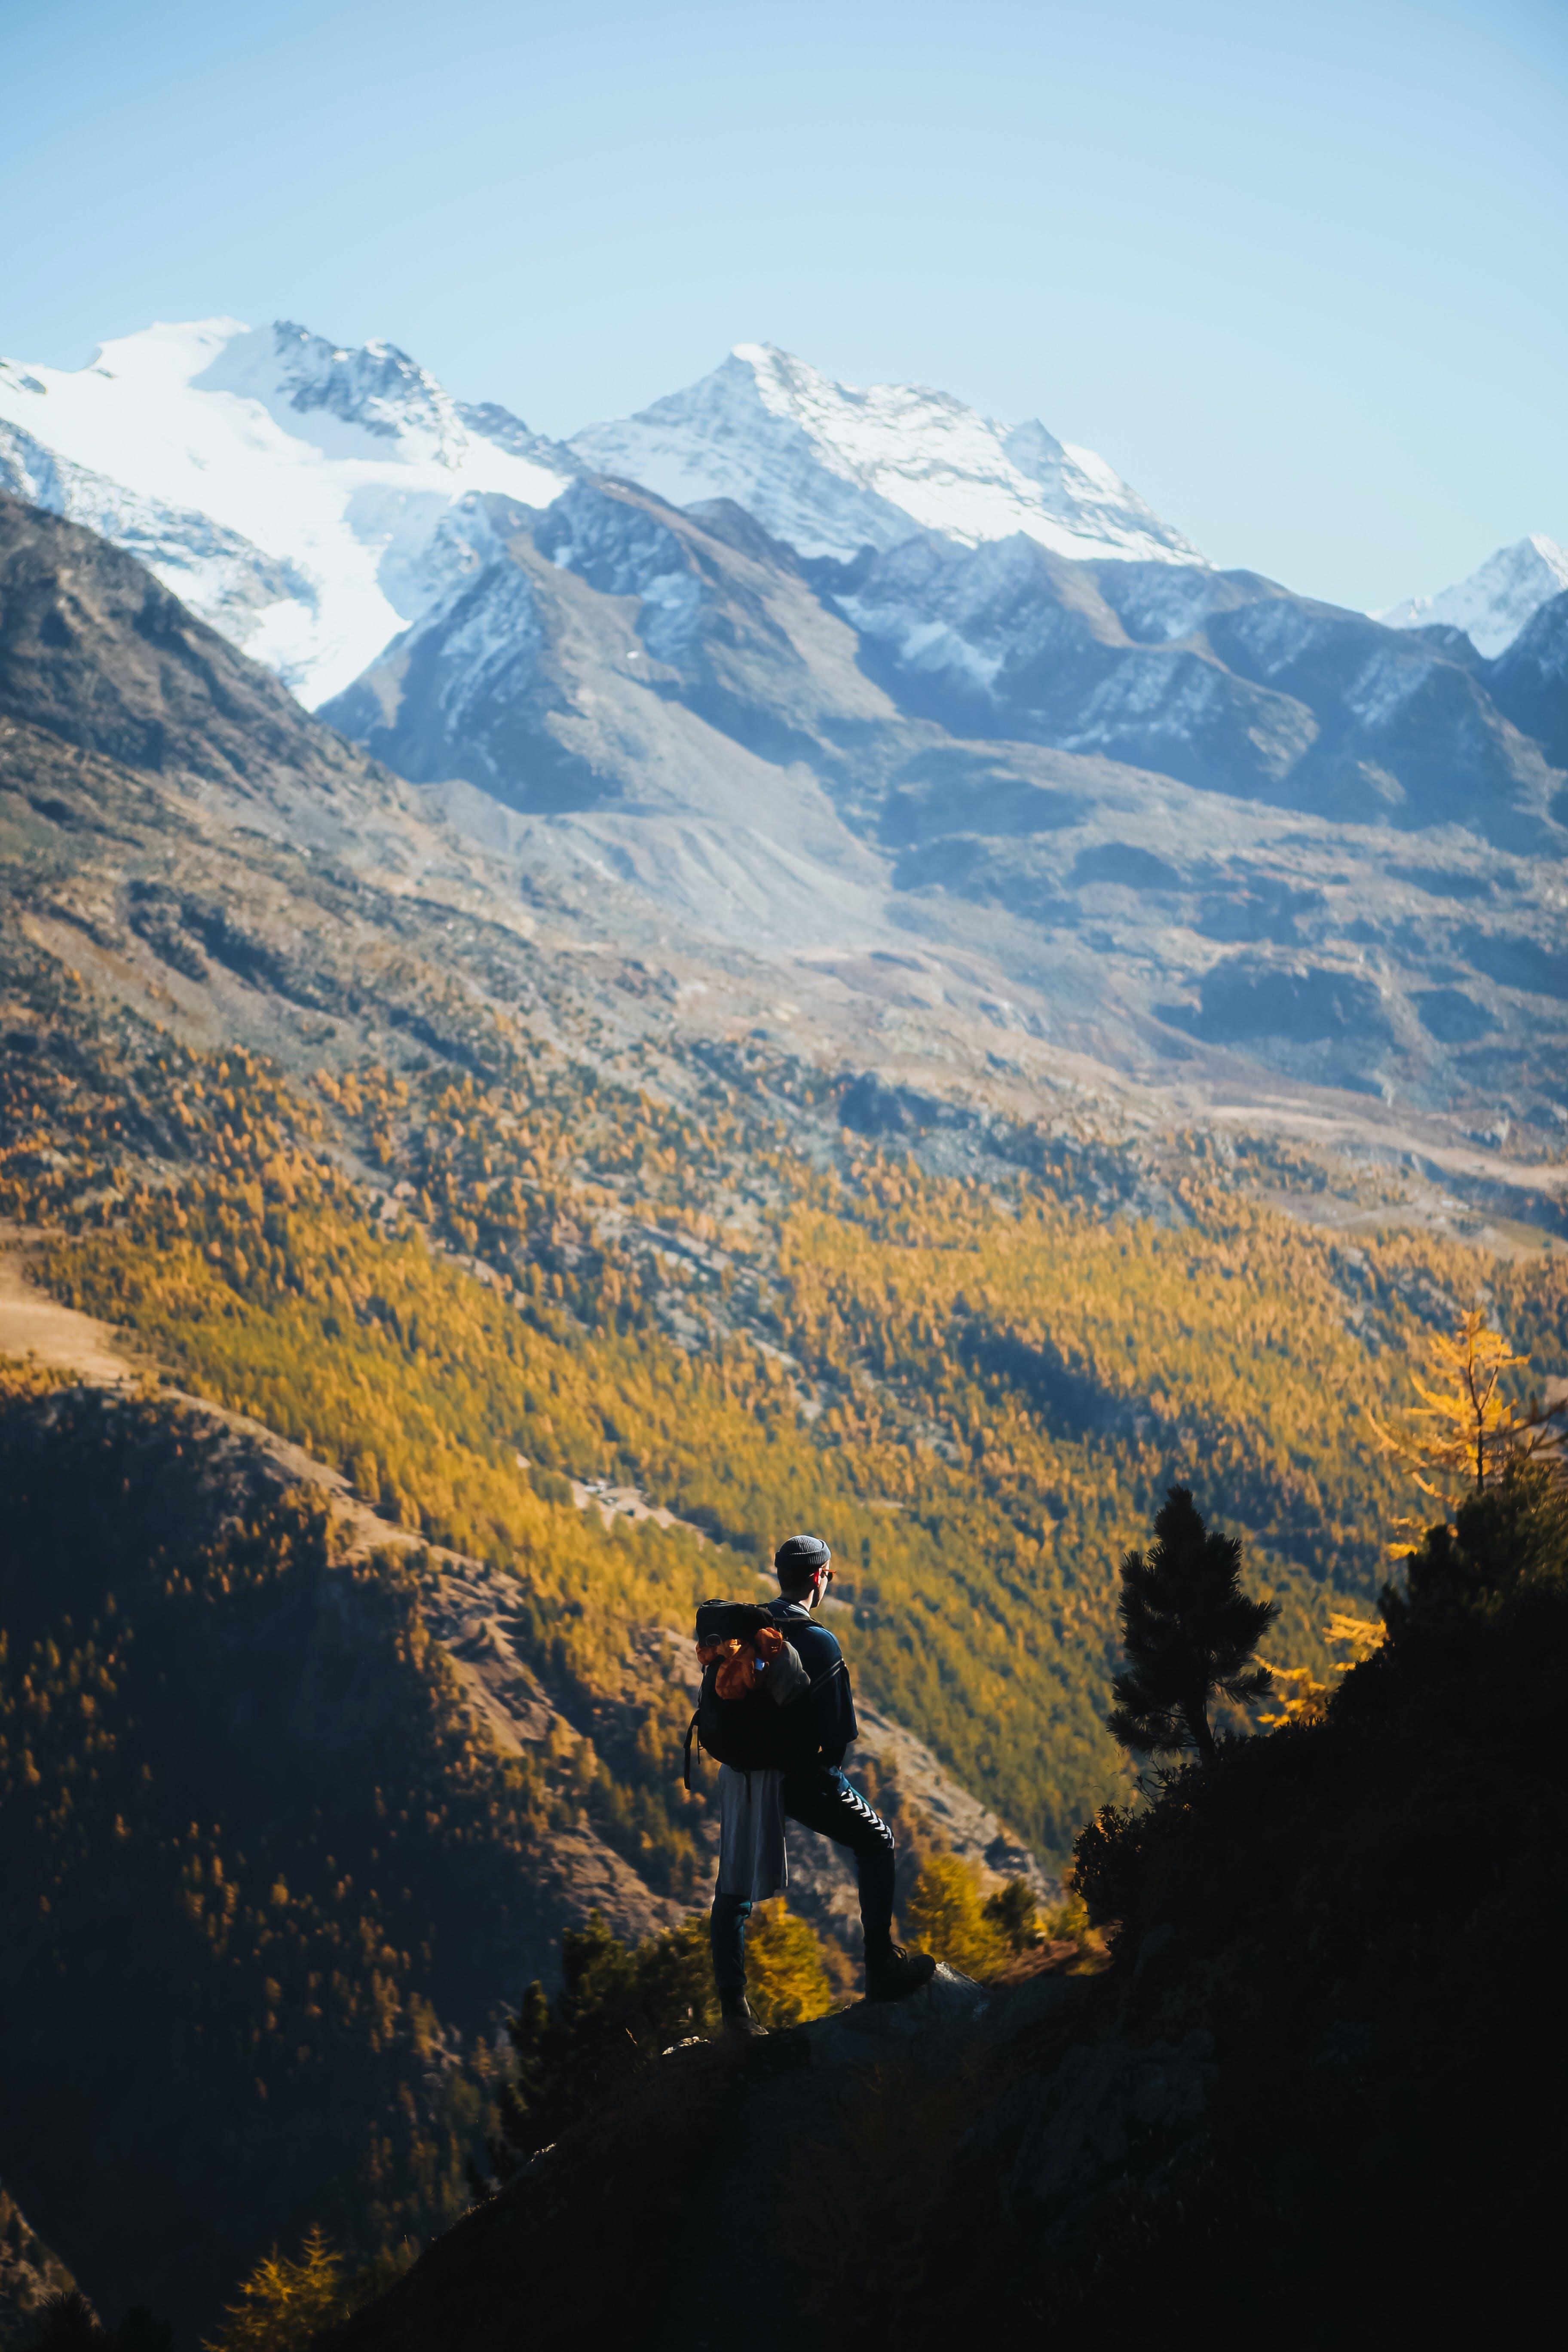 abenteuer, berg, landschaft